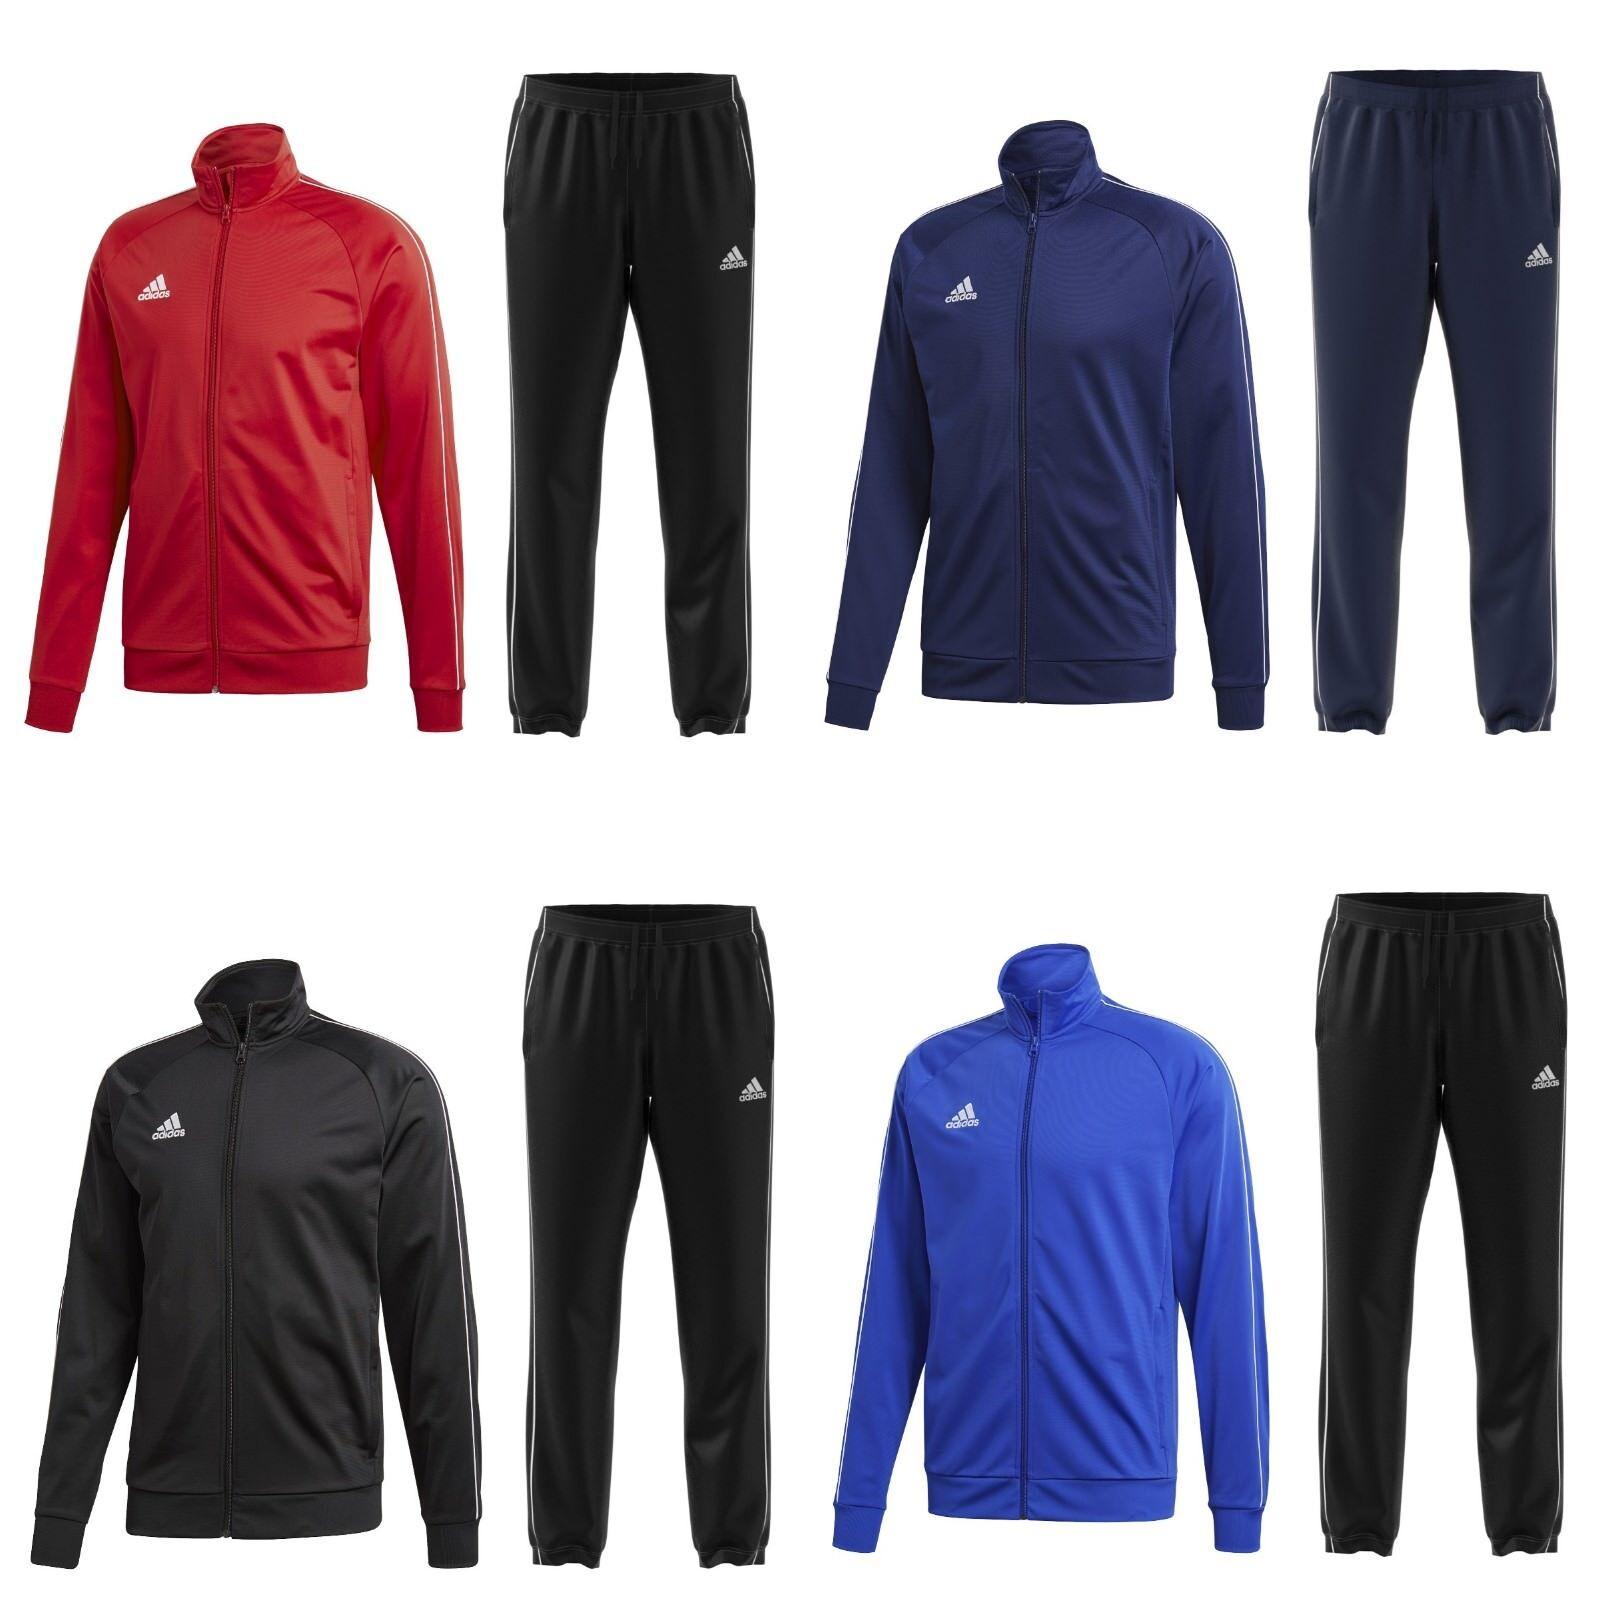 30bdd9be0634ef adidas Jogging Anzug Sportanzug Trainingsanzug Jogginganzug Herren Männer  Rot